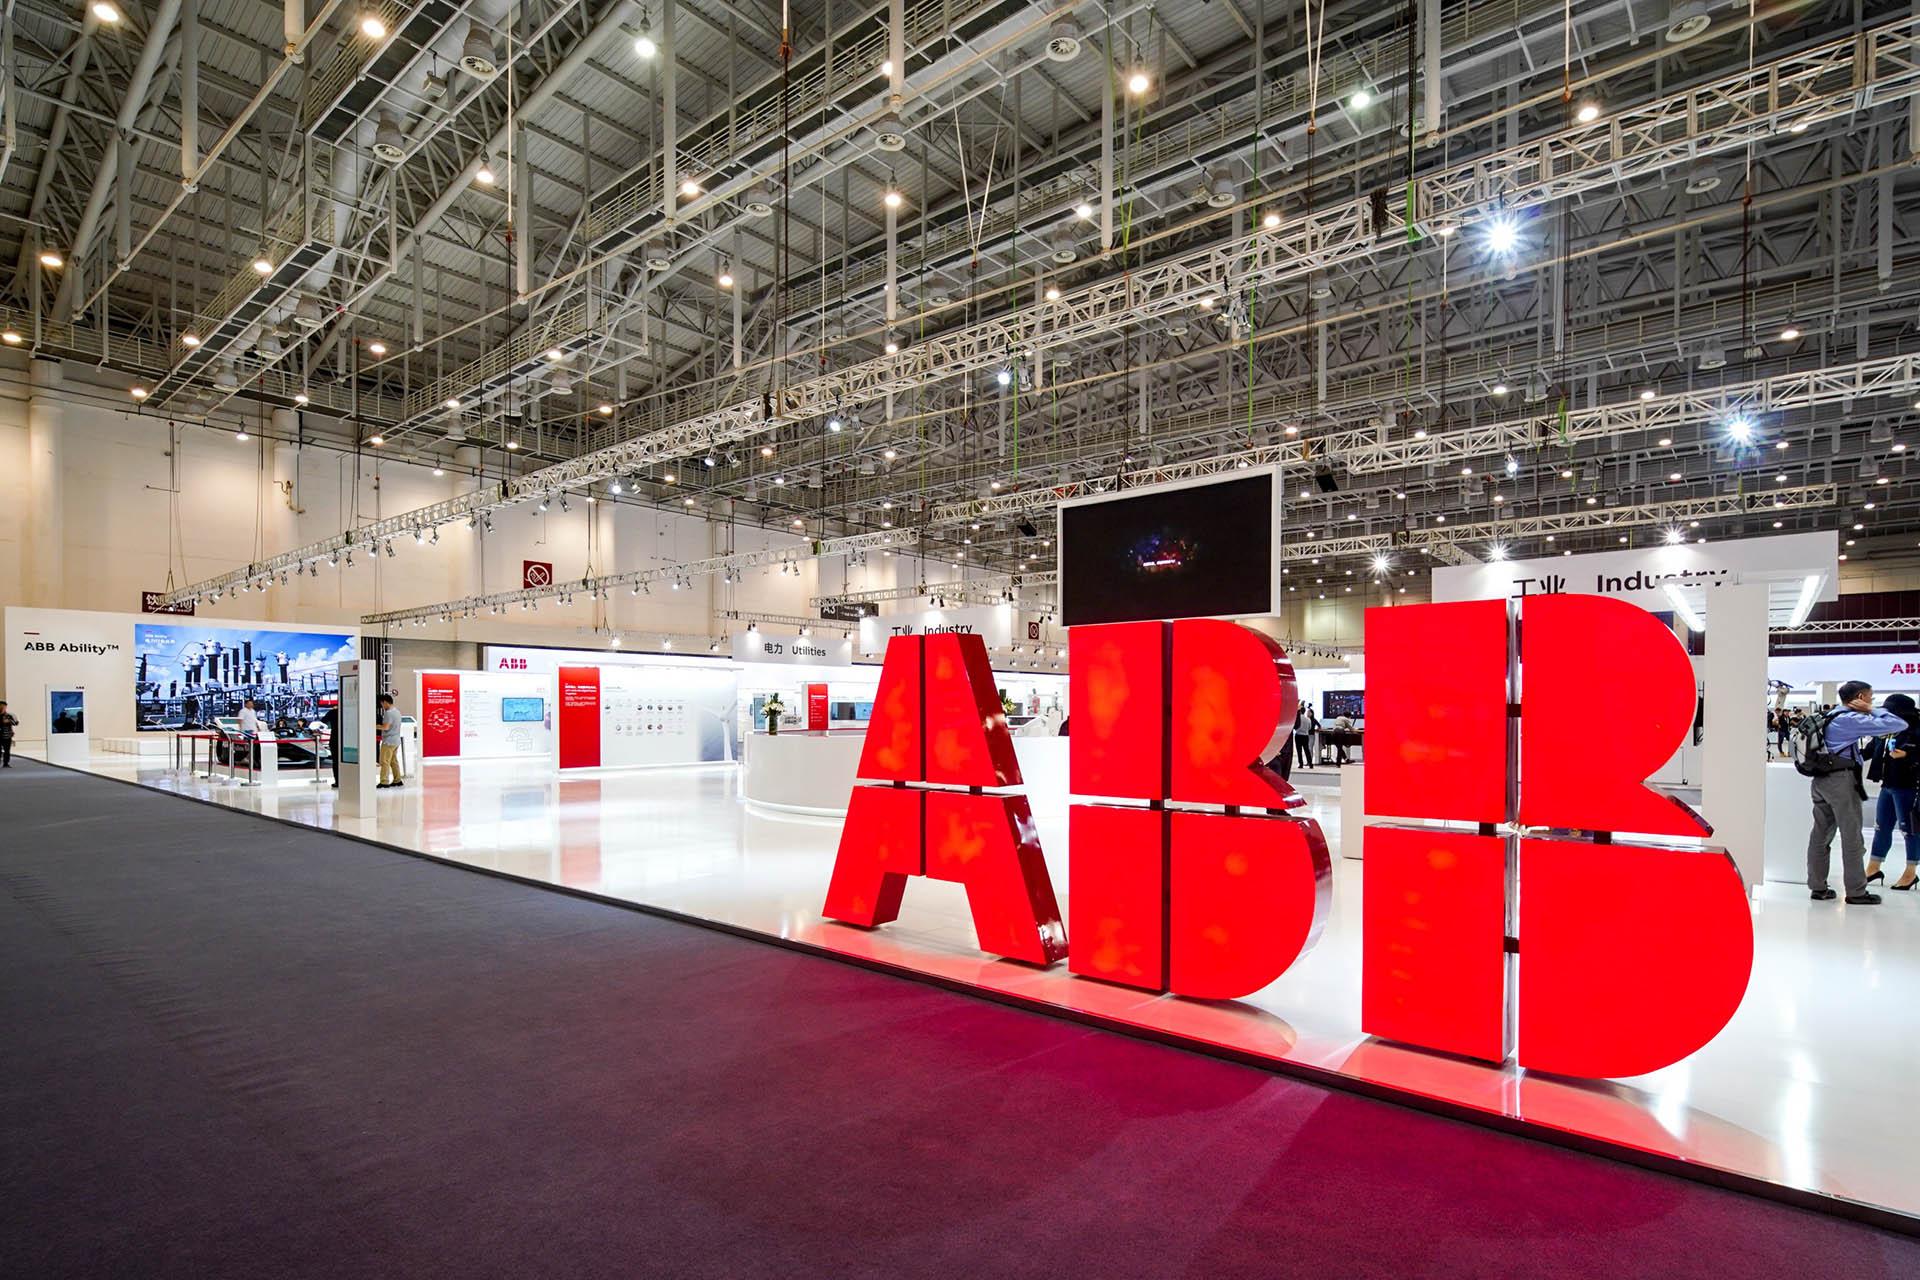 ABBとCOR-TF:勝利を約束する組み合わせ